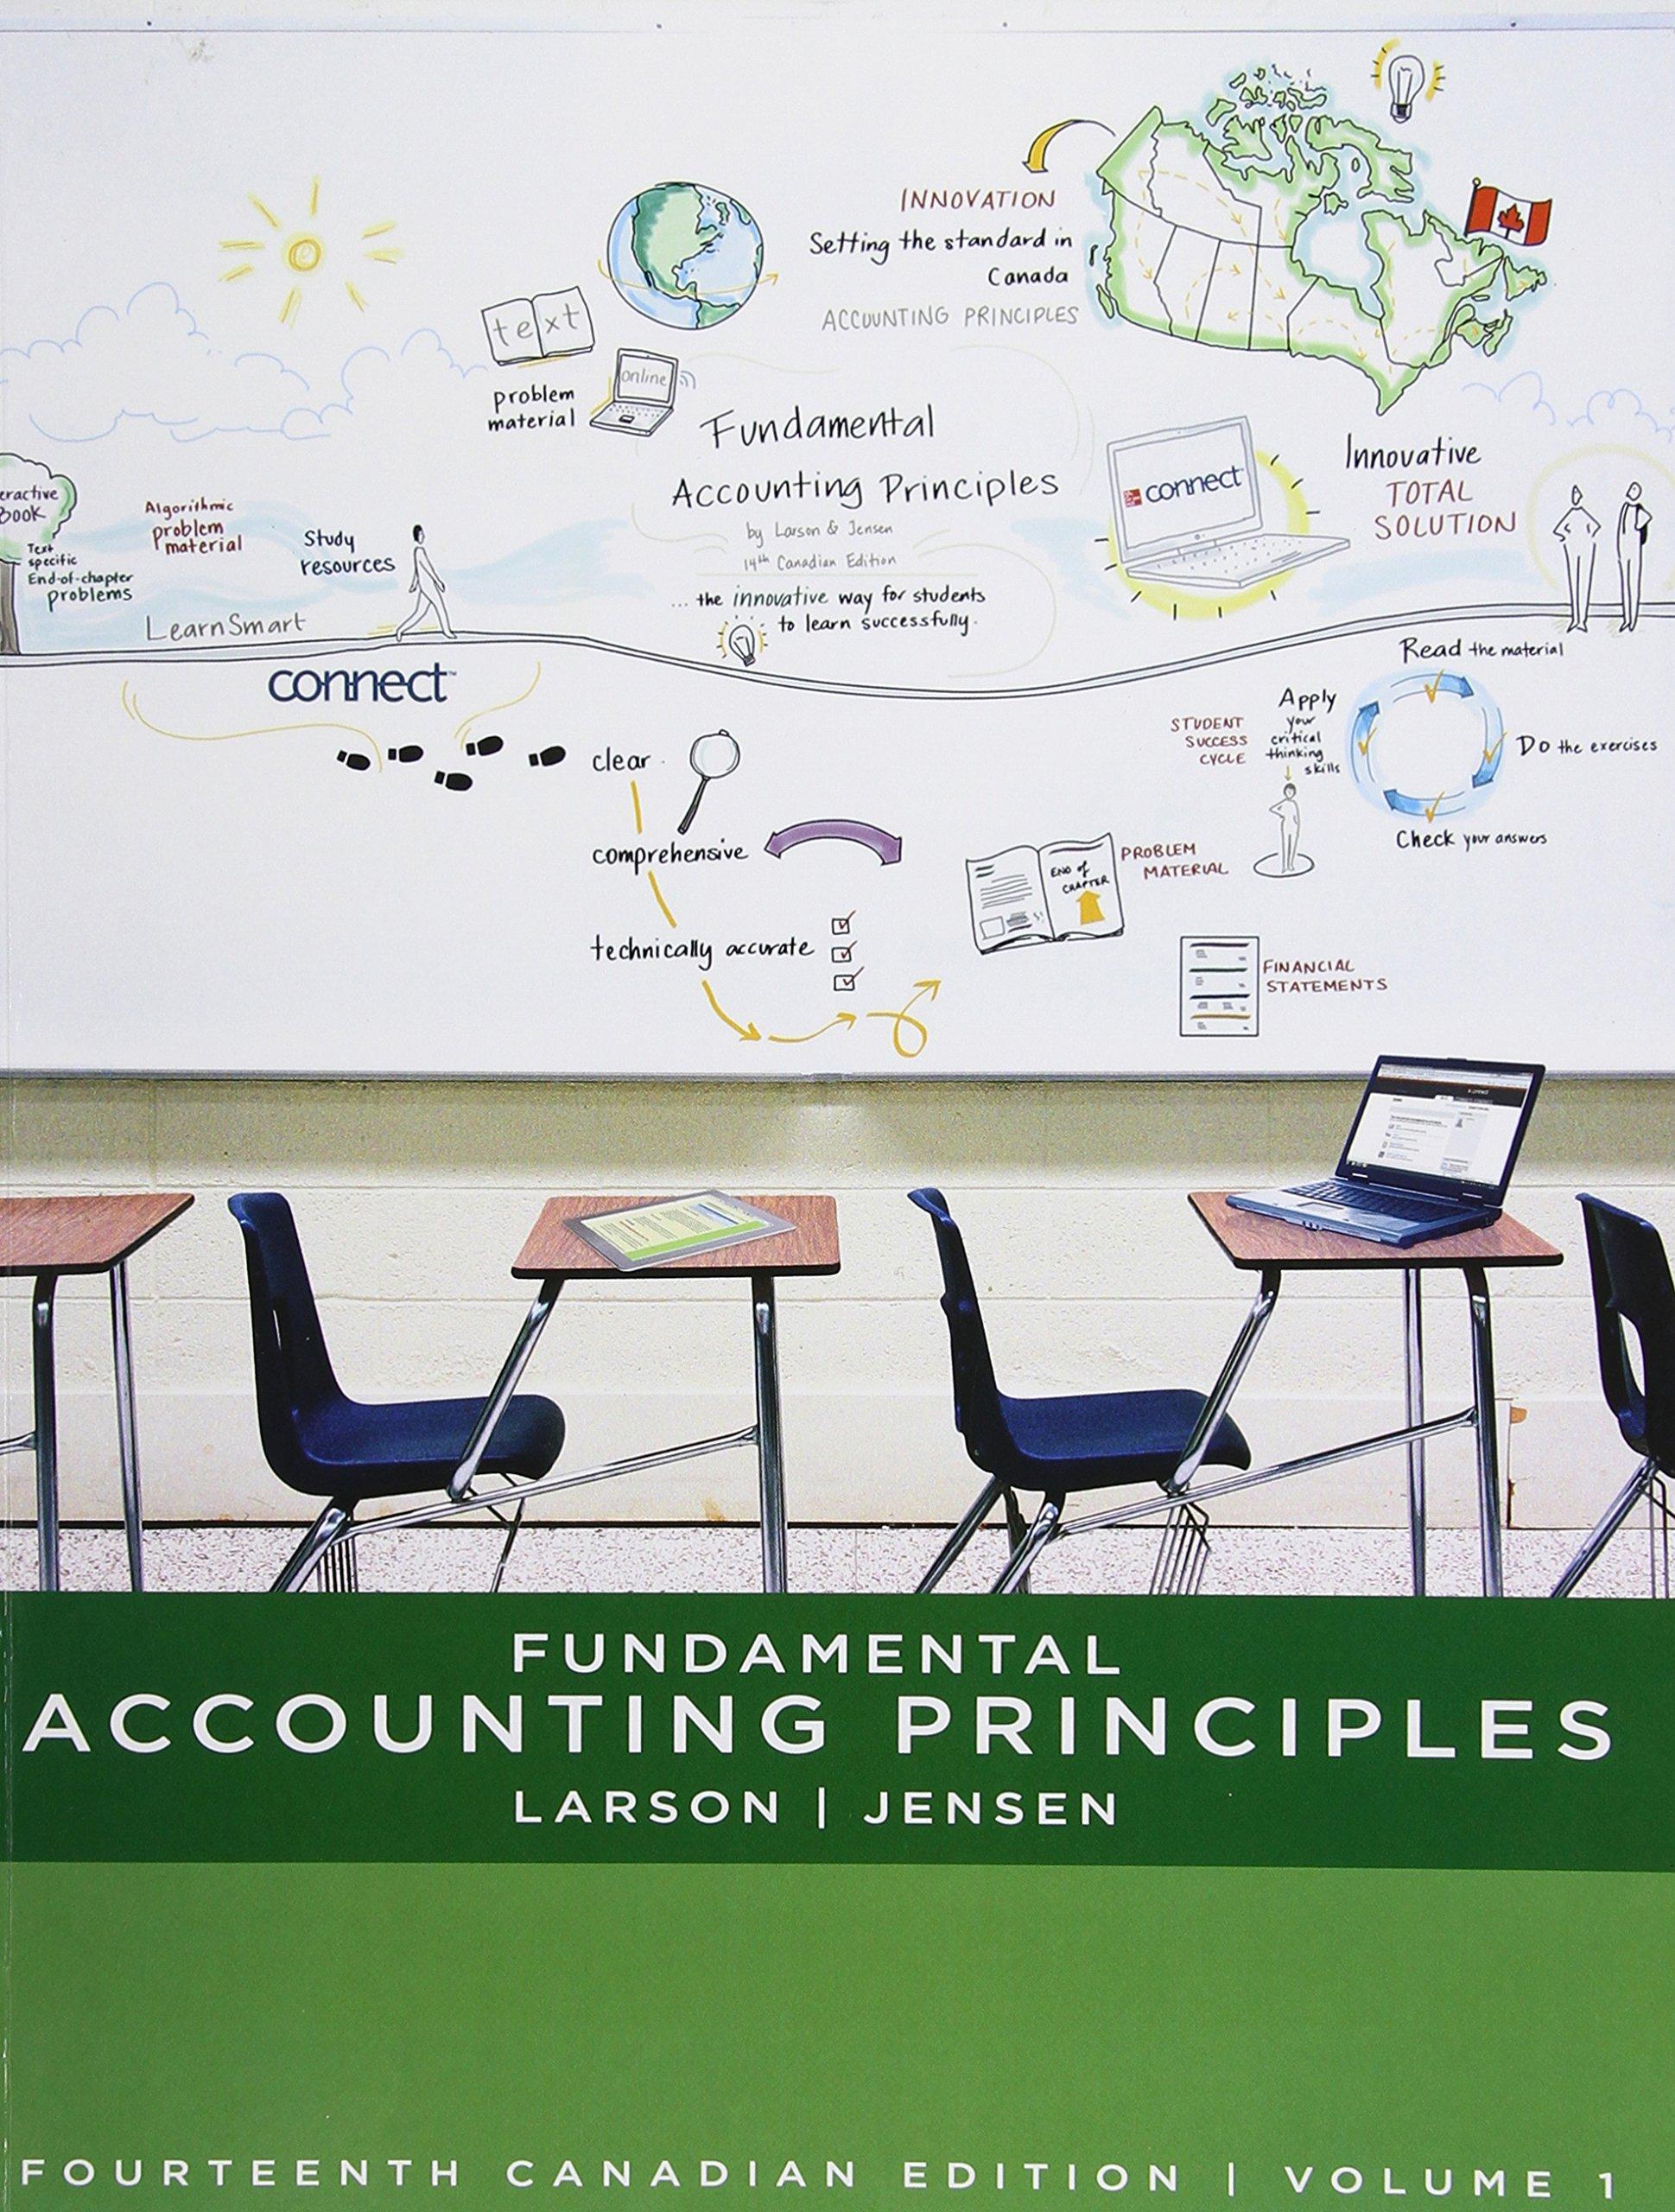 fundamental accounting principles volume 1 larson jensen rh amazon com Principles of Accounting Cheat Sheet solution manual according to accounting principles 10th edition